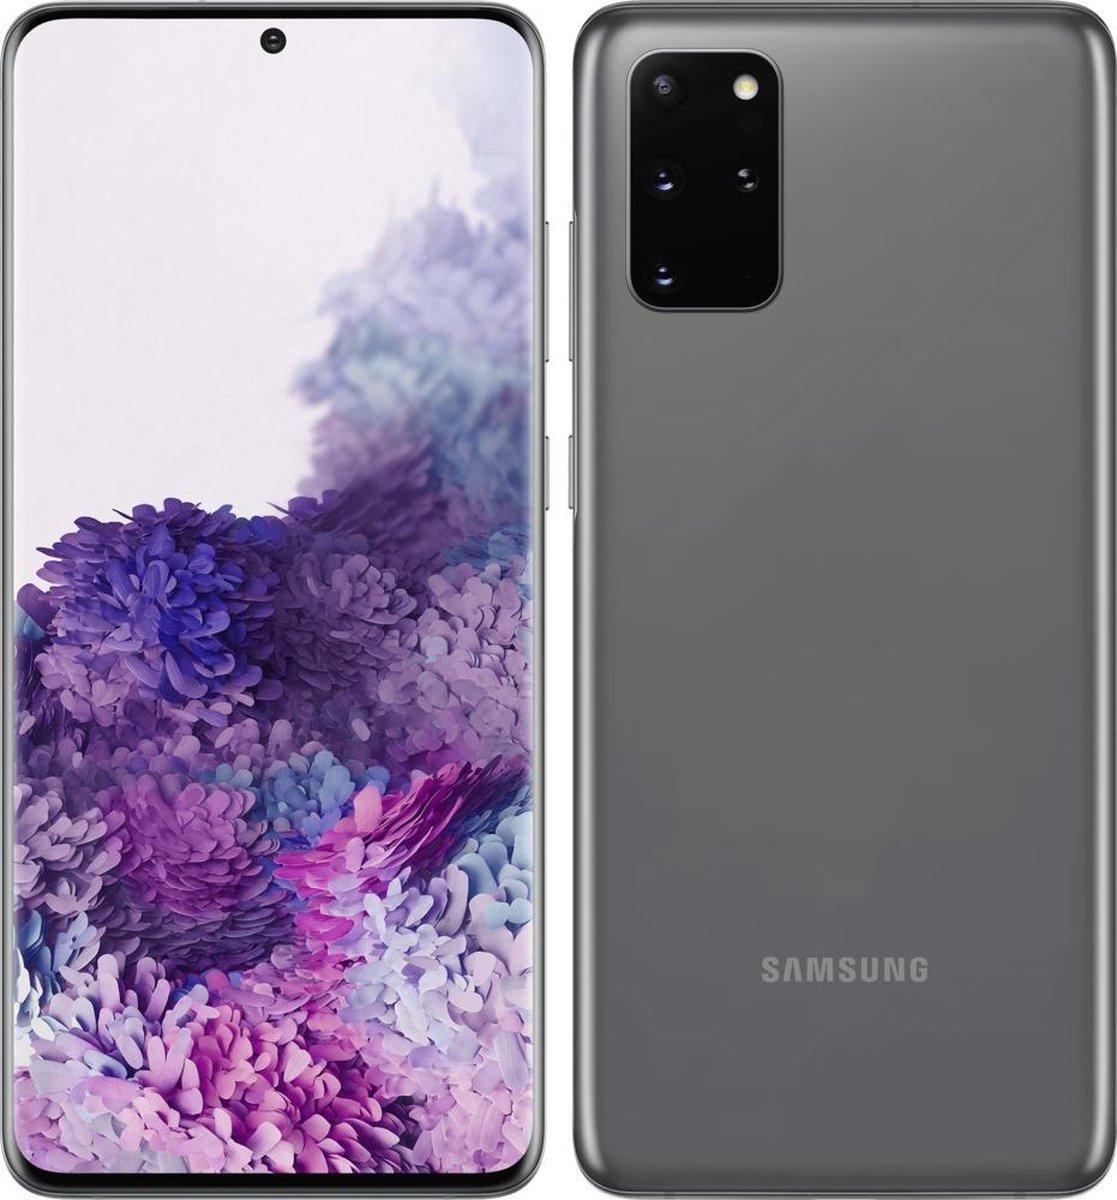 Samsung Galaxy S20+ 5G – Alloccaz Refurbished – A grade (Zo goed als nieuw) – 128GB – Zwart (Prism Black)